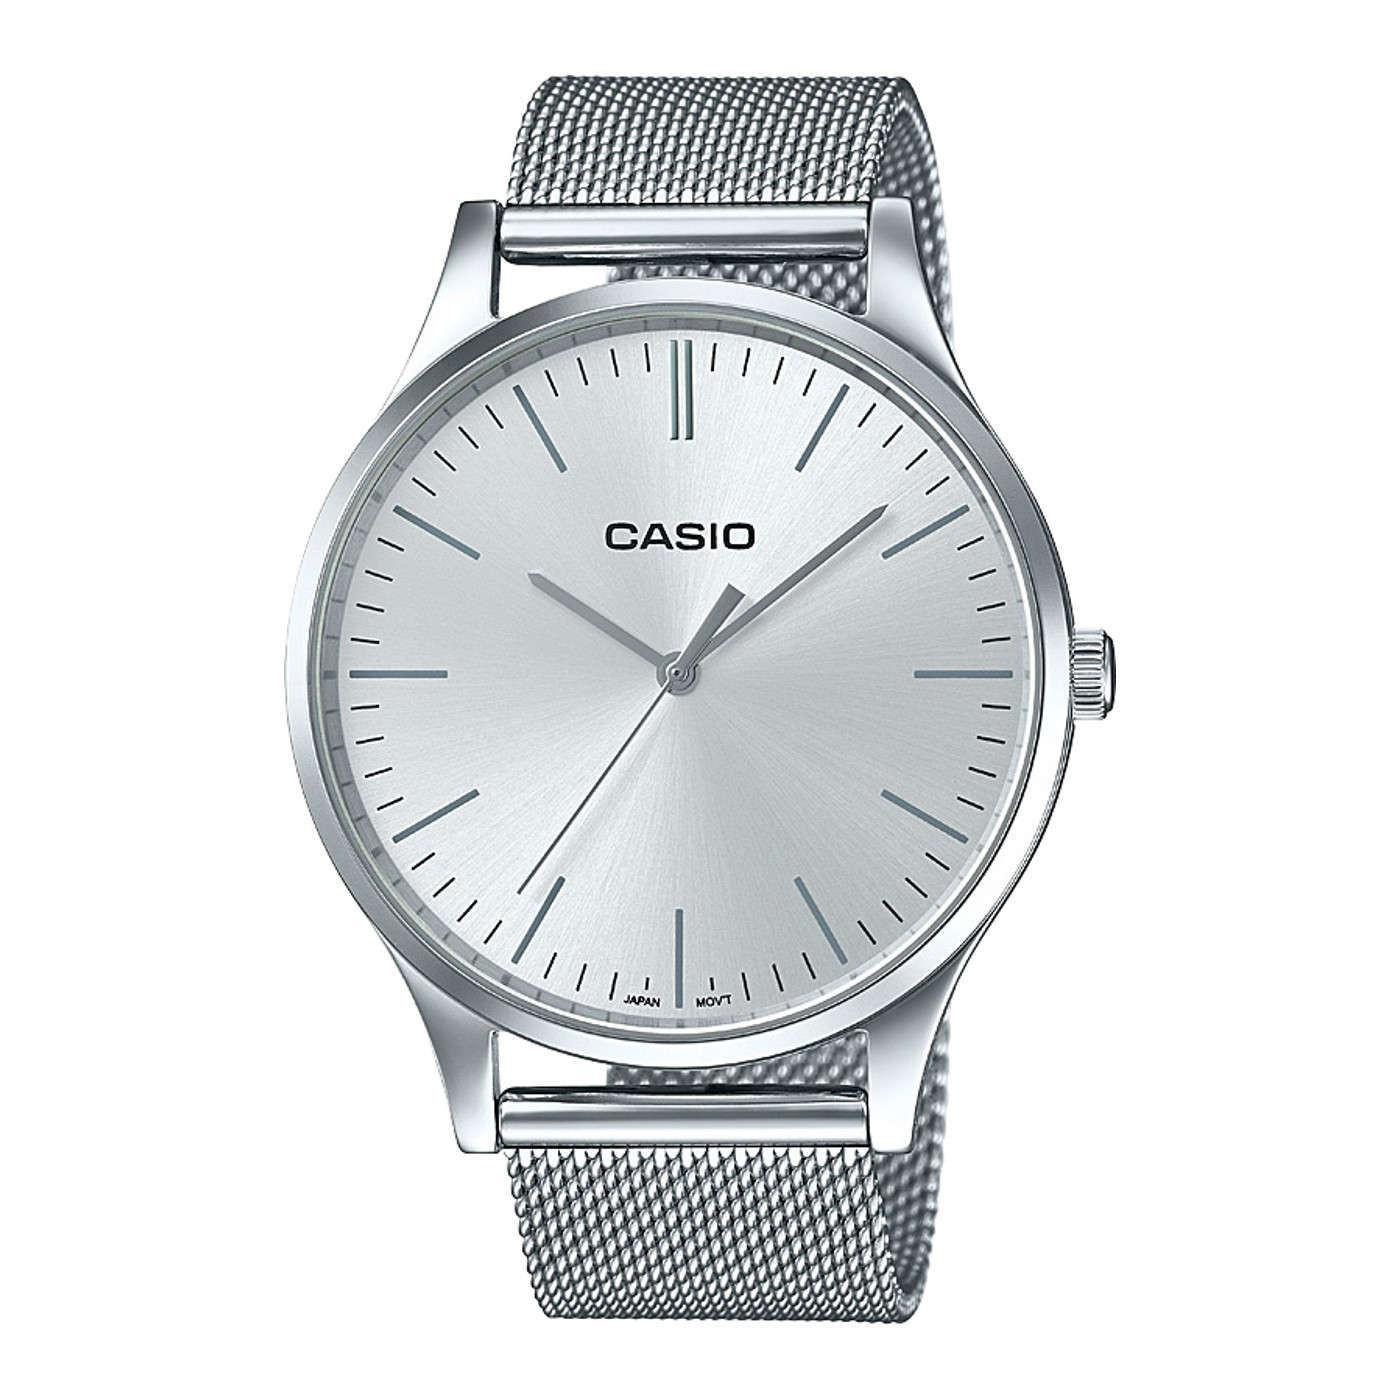 83d0a2b9757 Casio Retro horloge LTP-E140D-7AEF